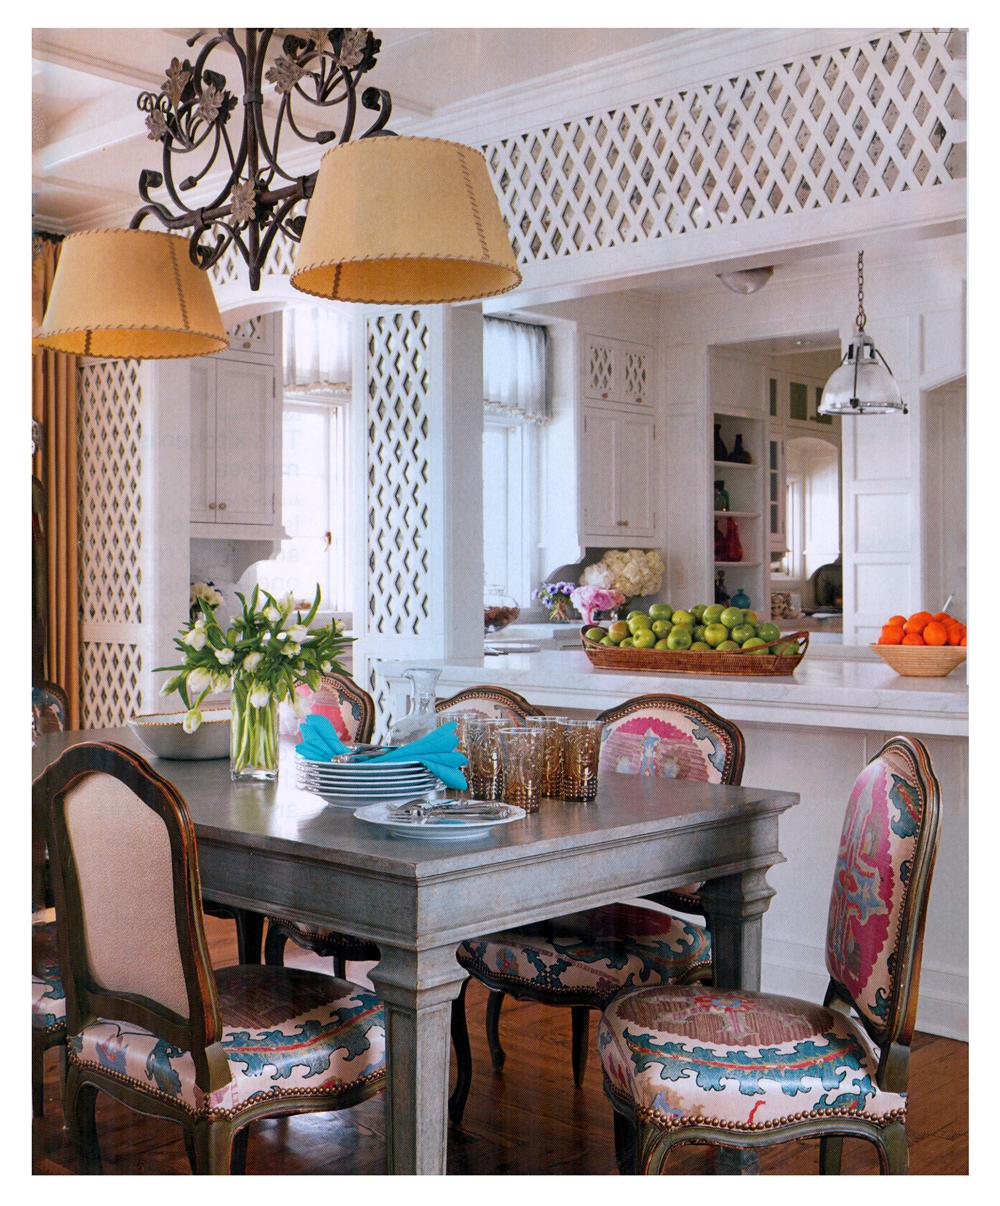 Allison Caccom house beautiful-sparkle-7.png